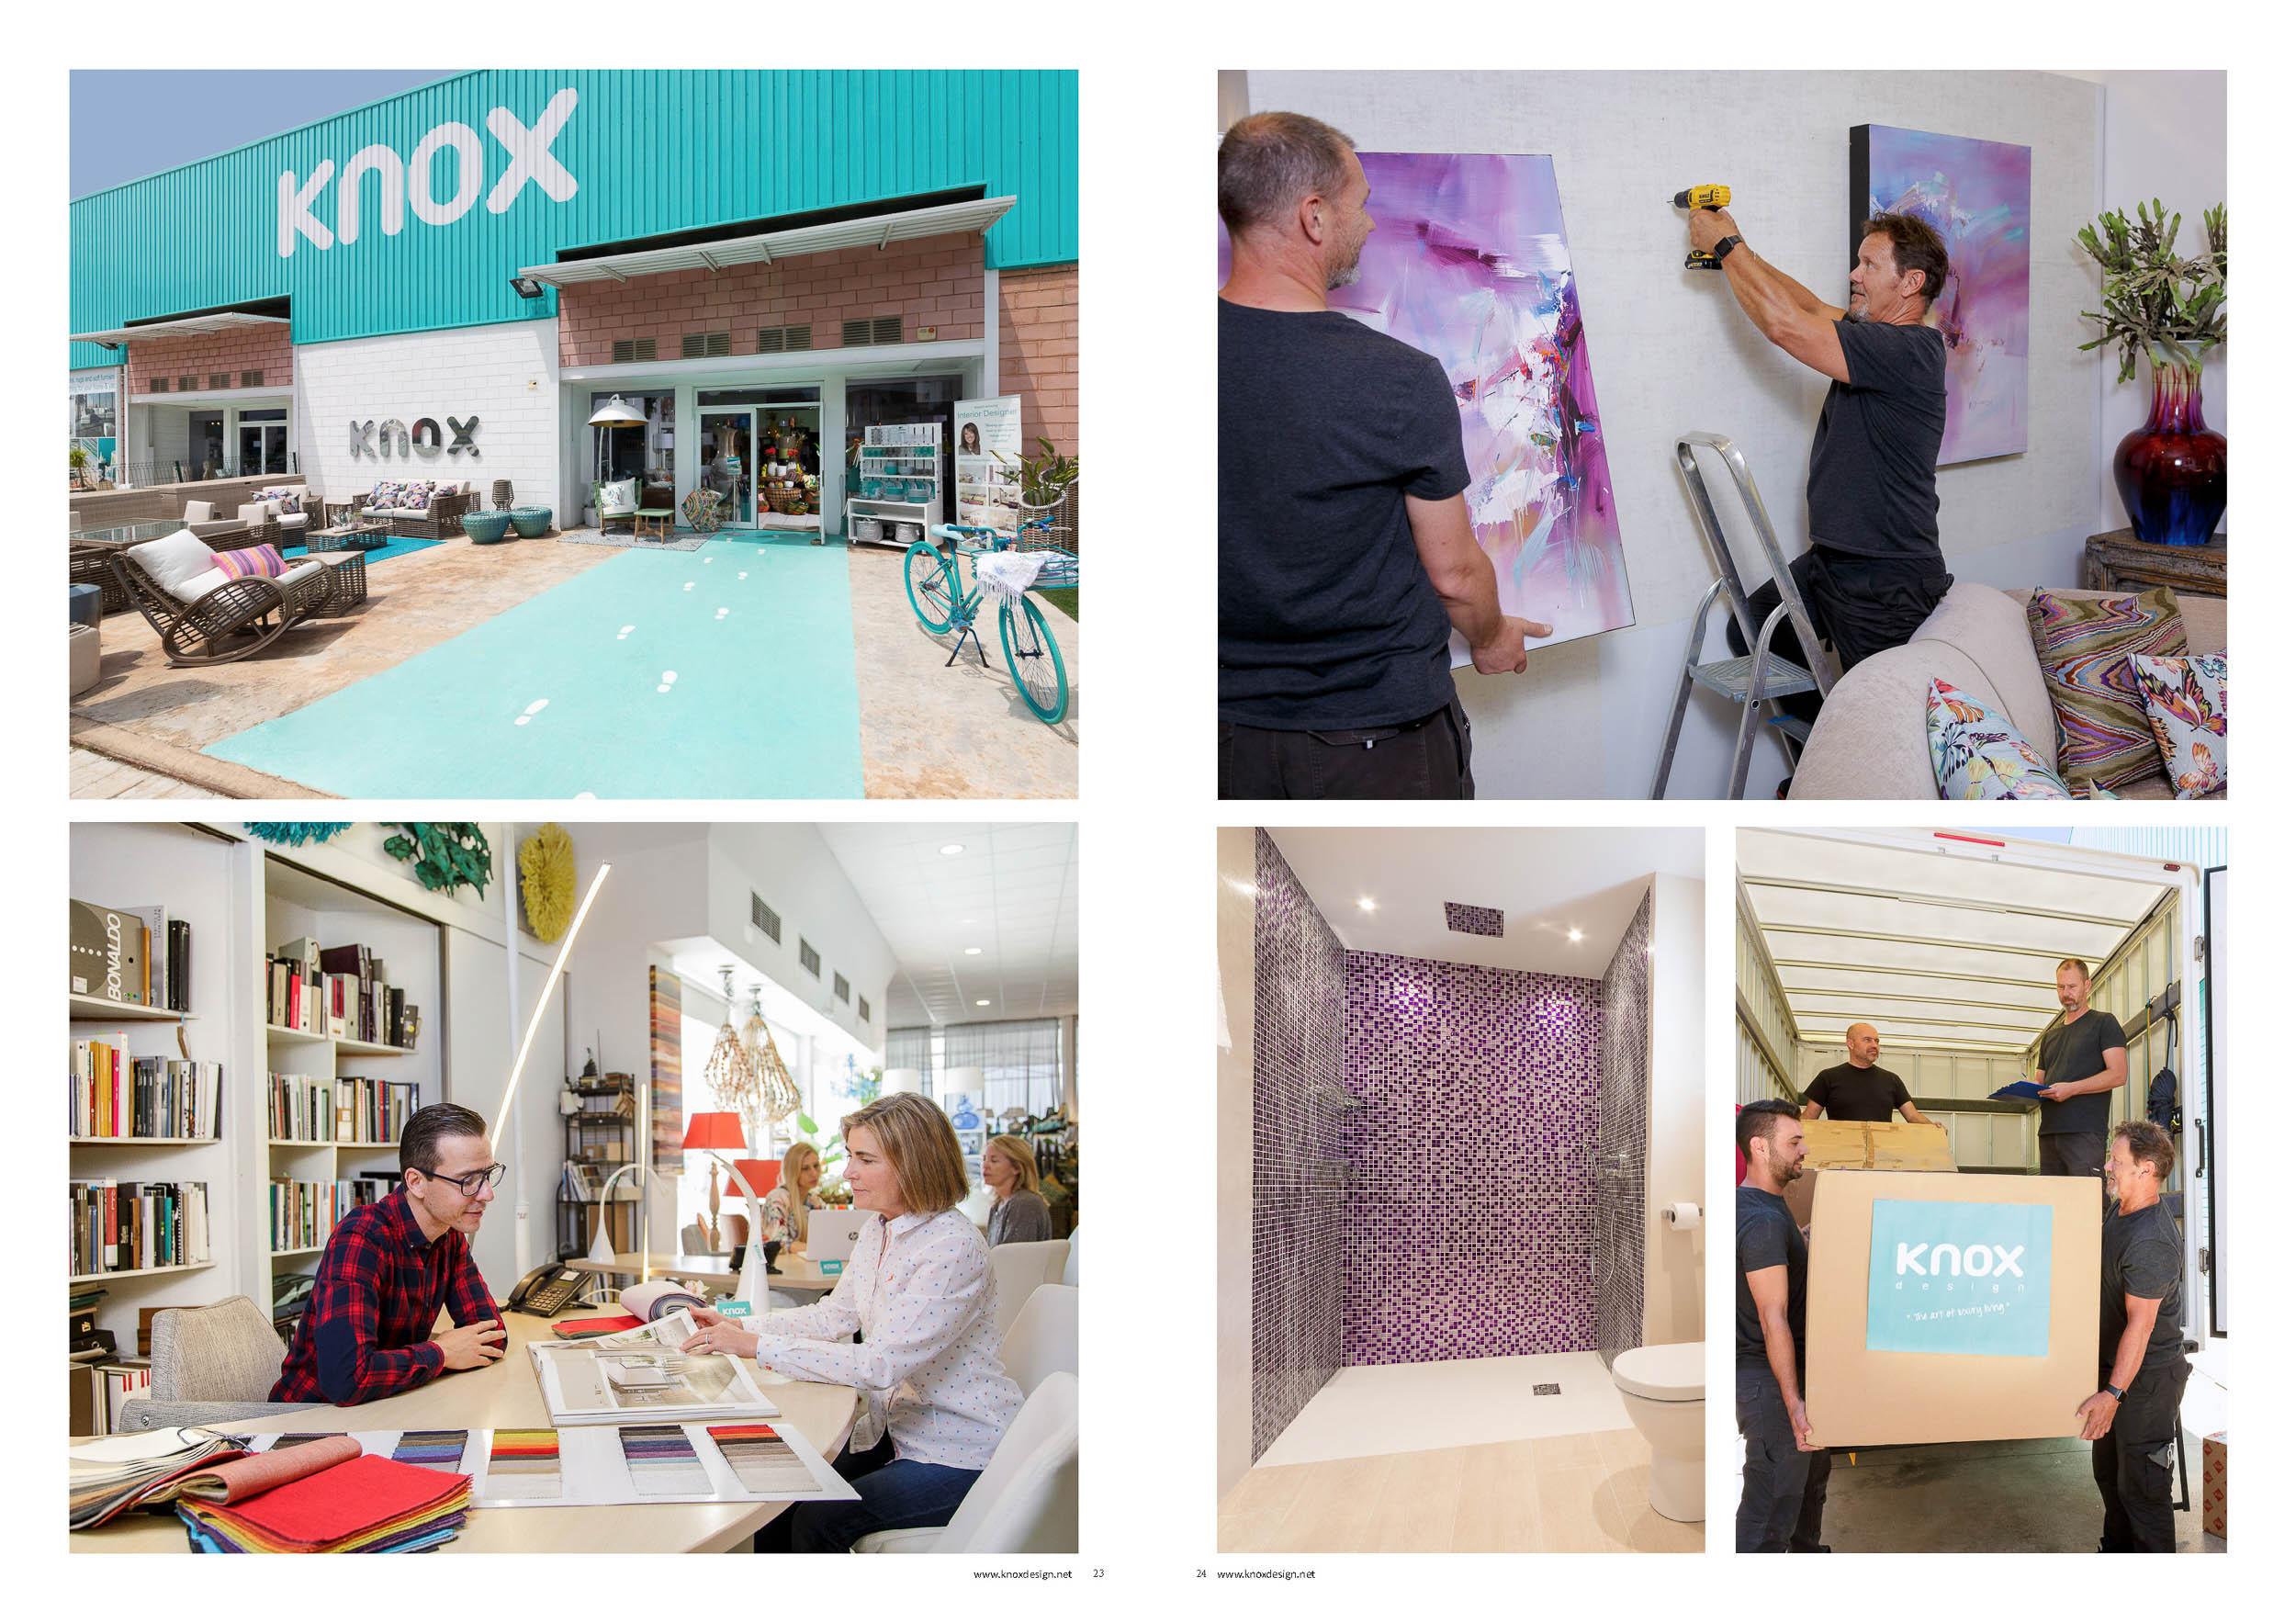 KNOX Design 3-8.jpg